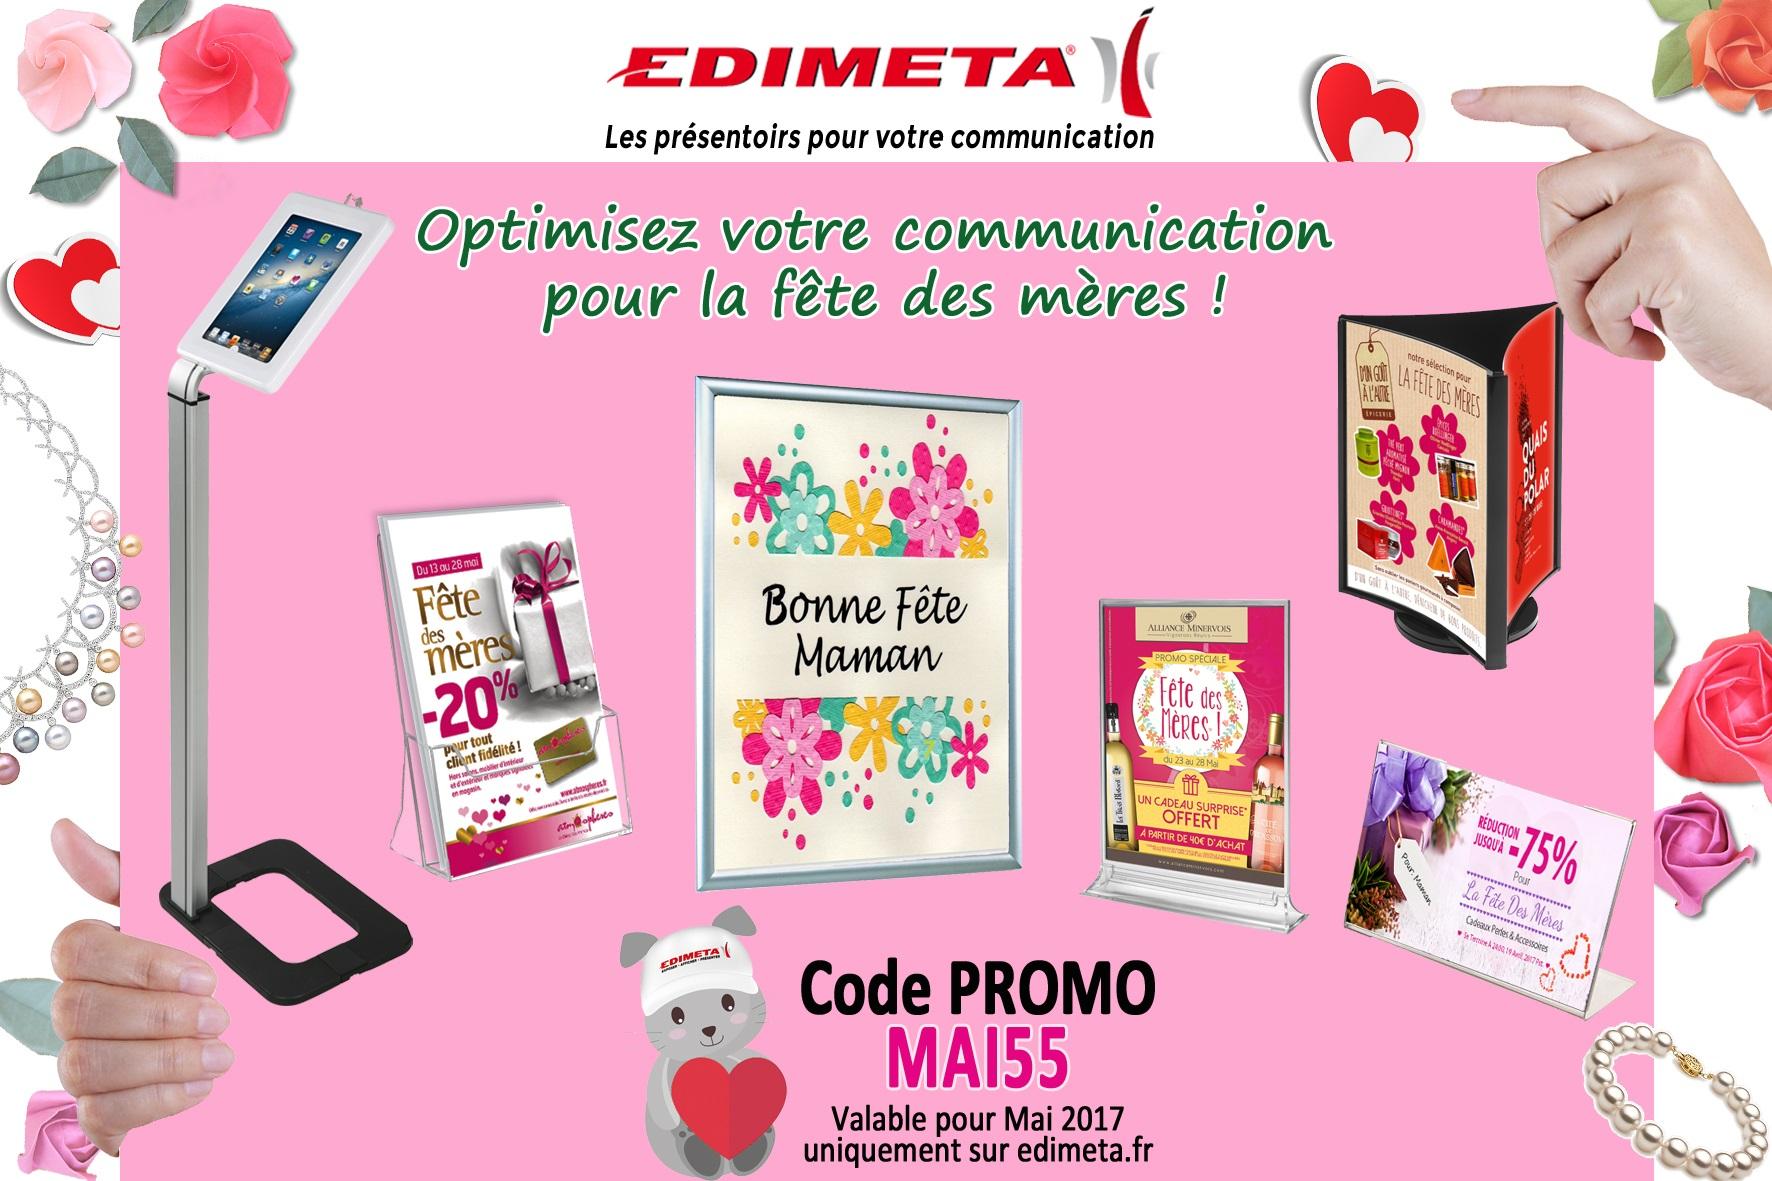 EDIMETA - Code promo pour mai 2017